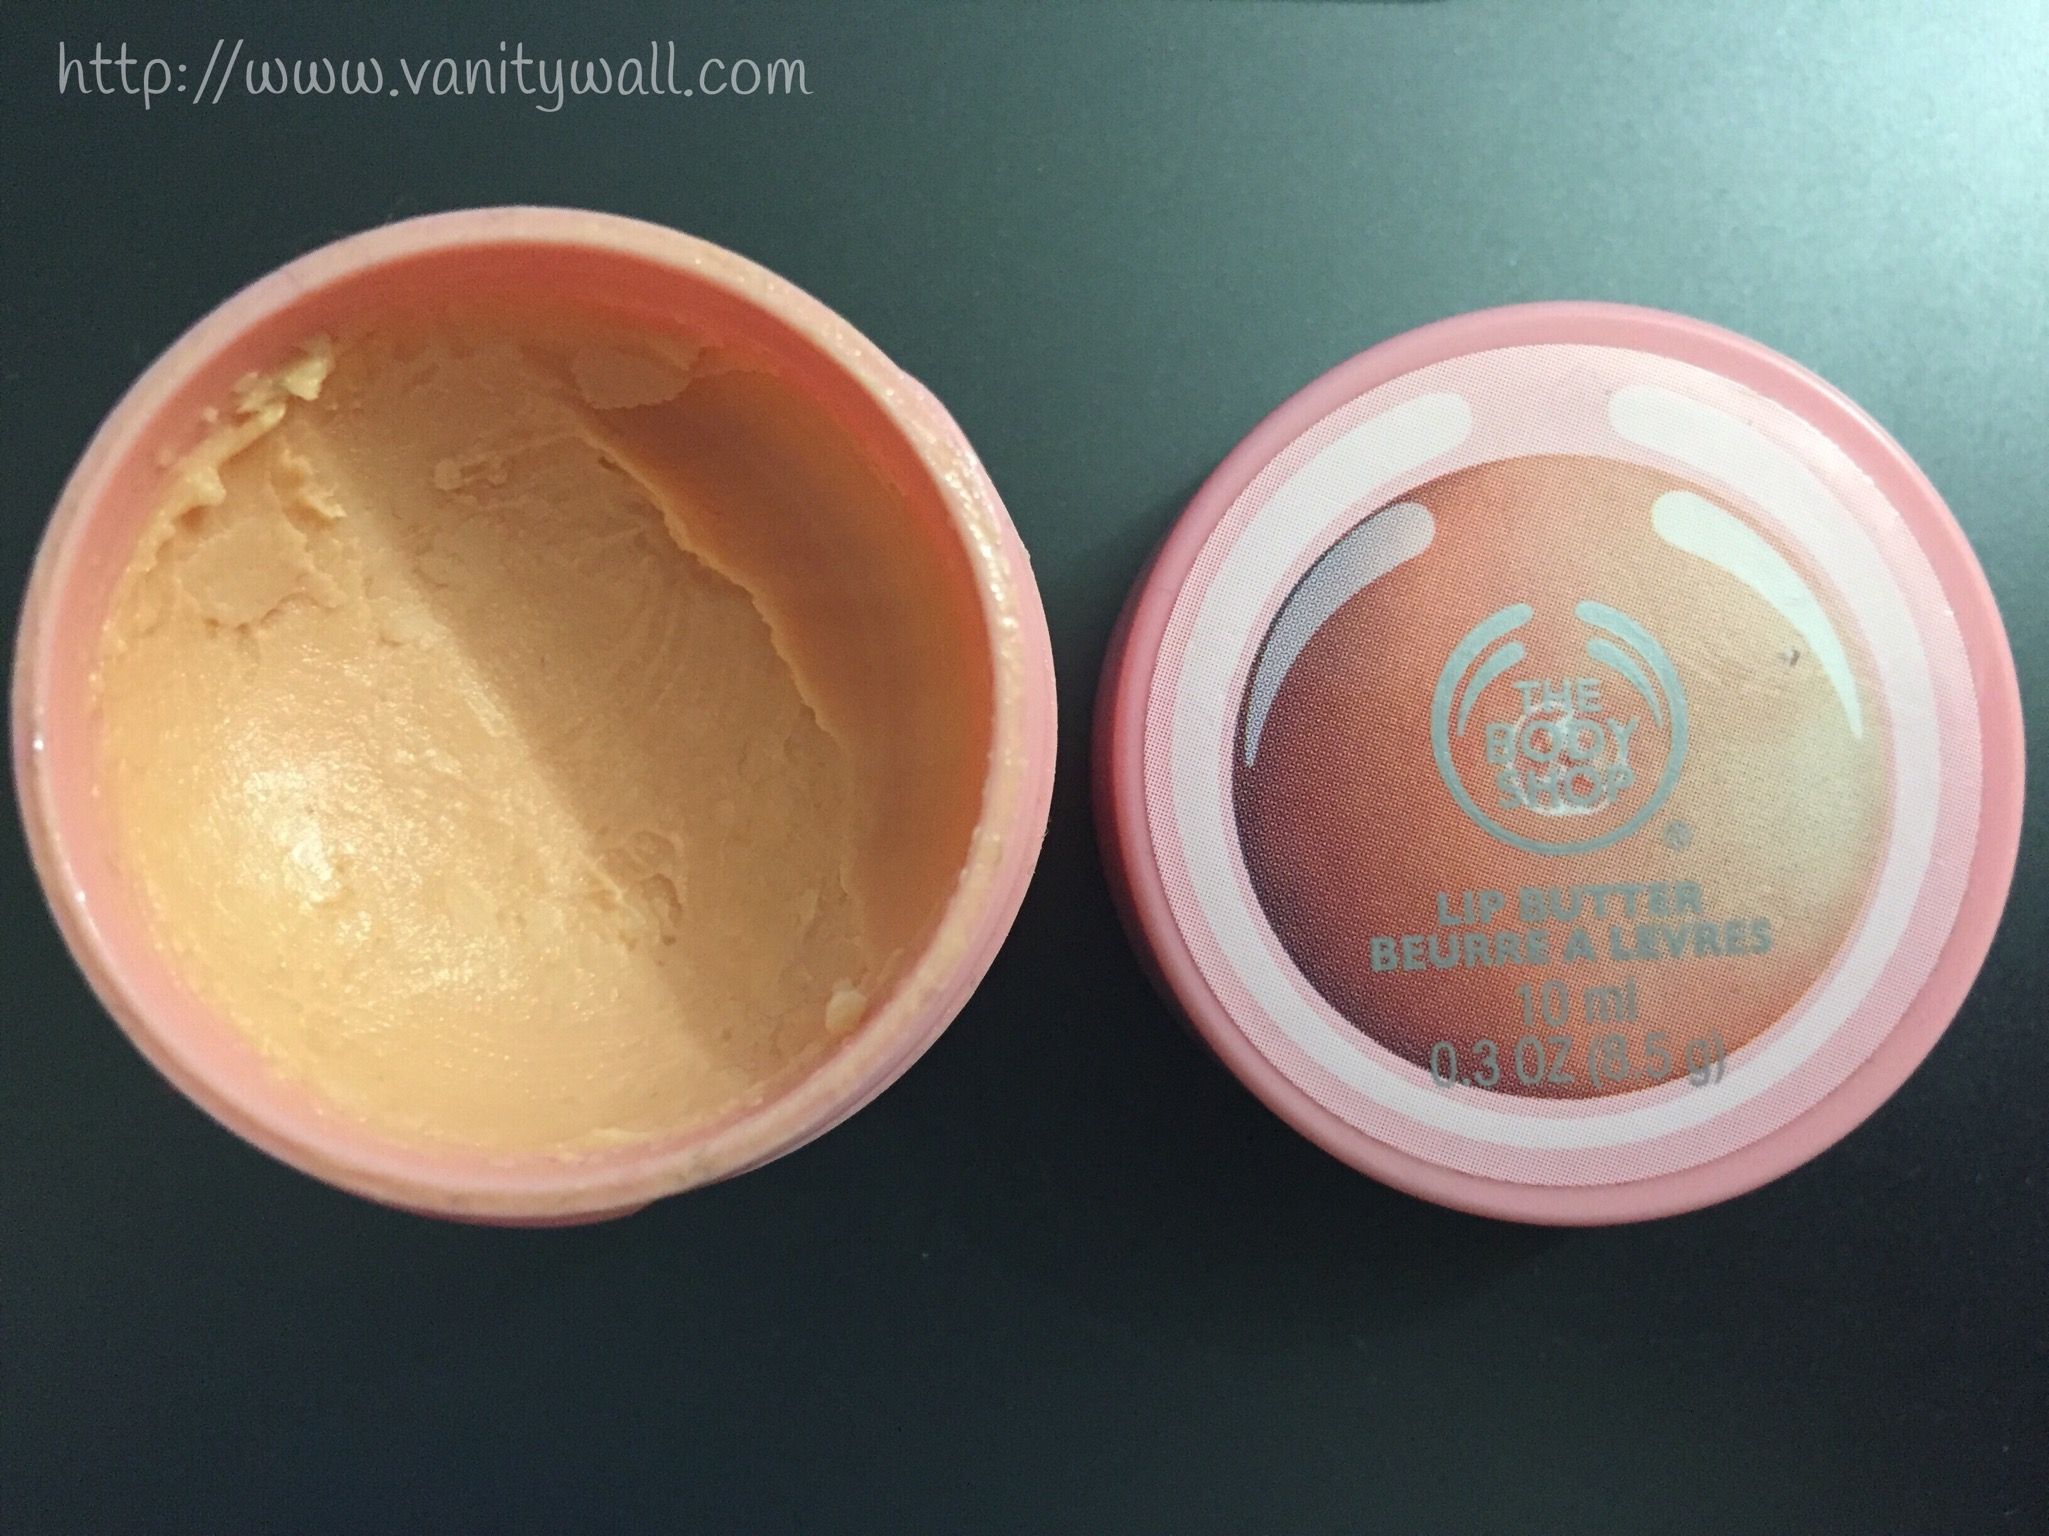 the body shop pink grapefruit lip butter review